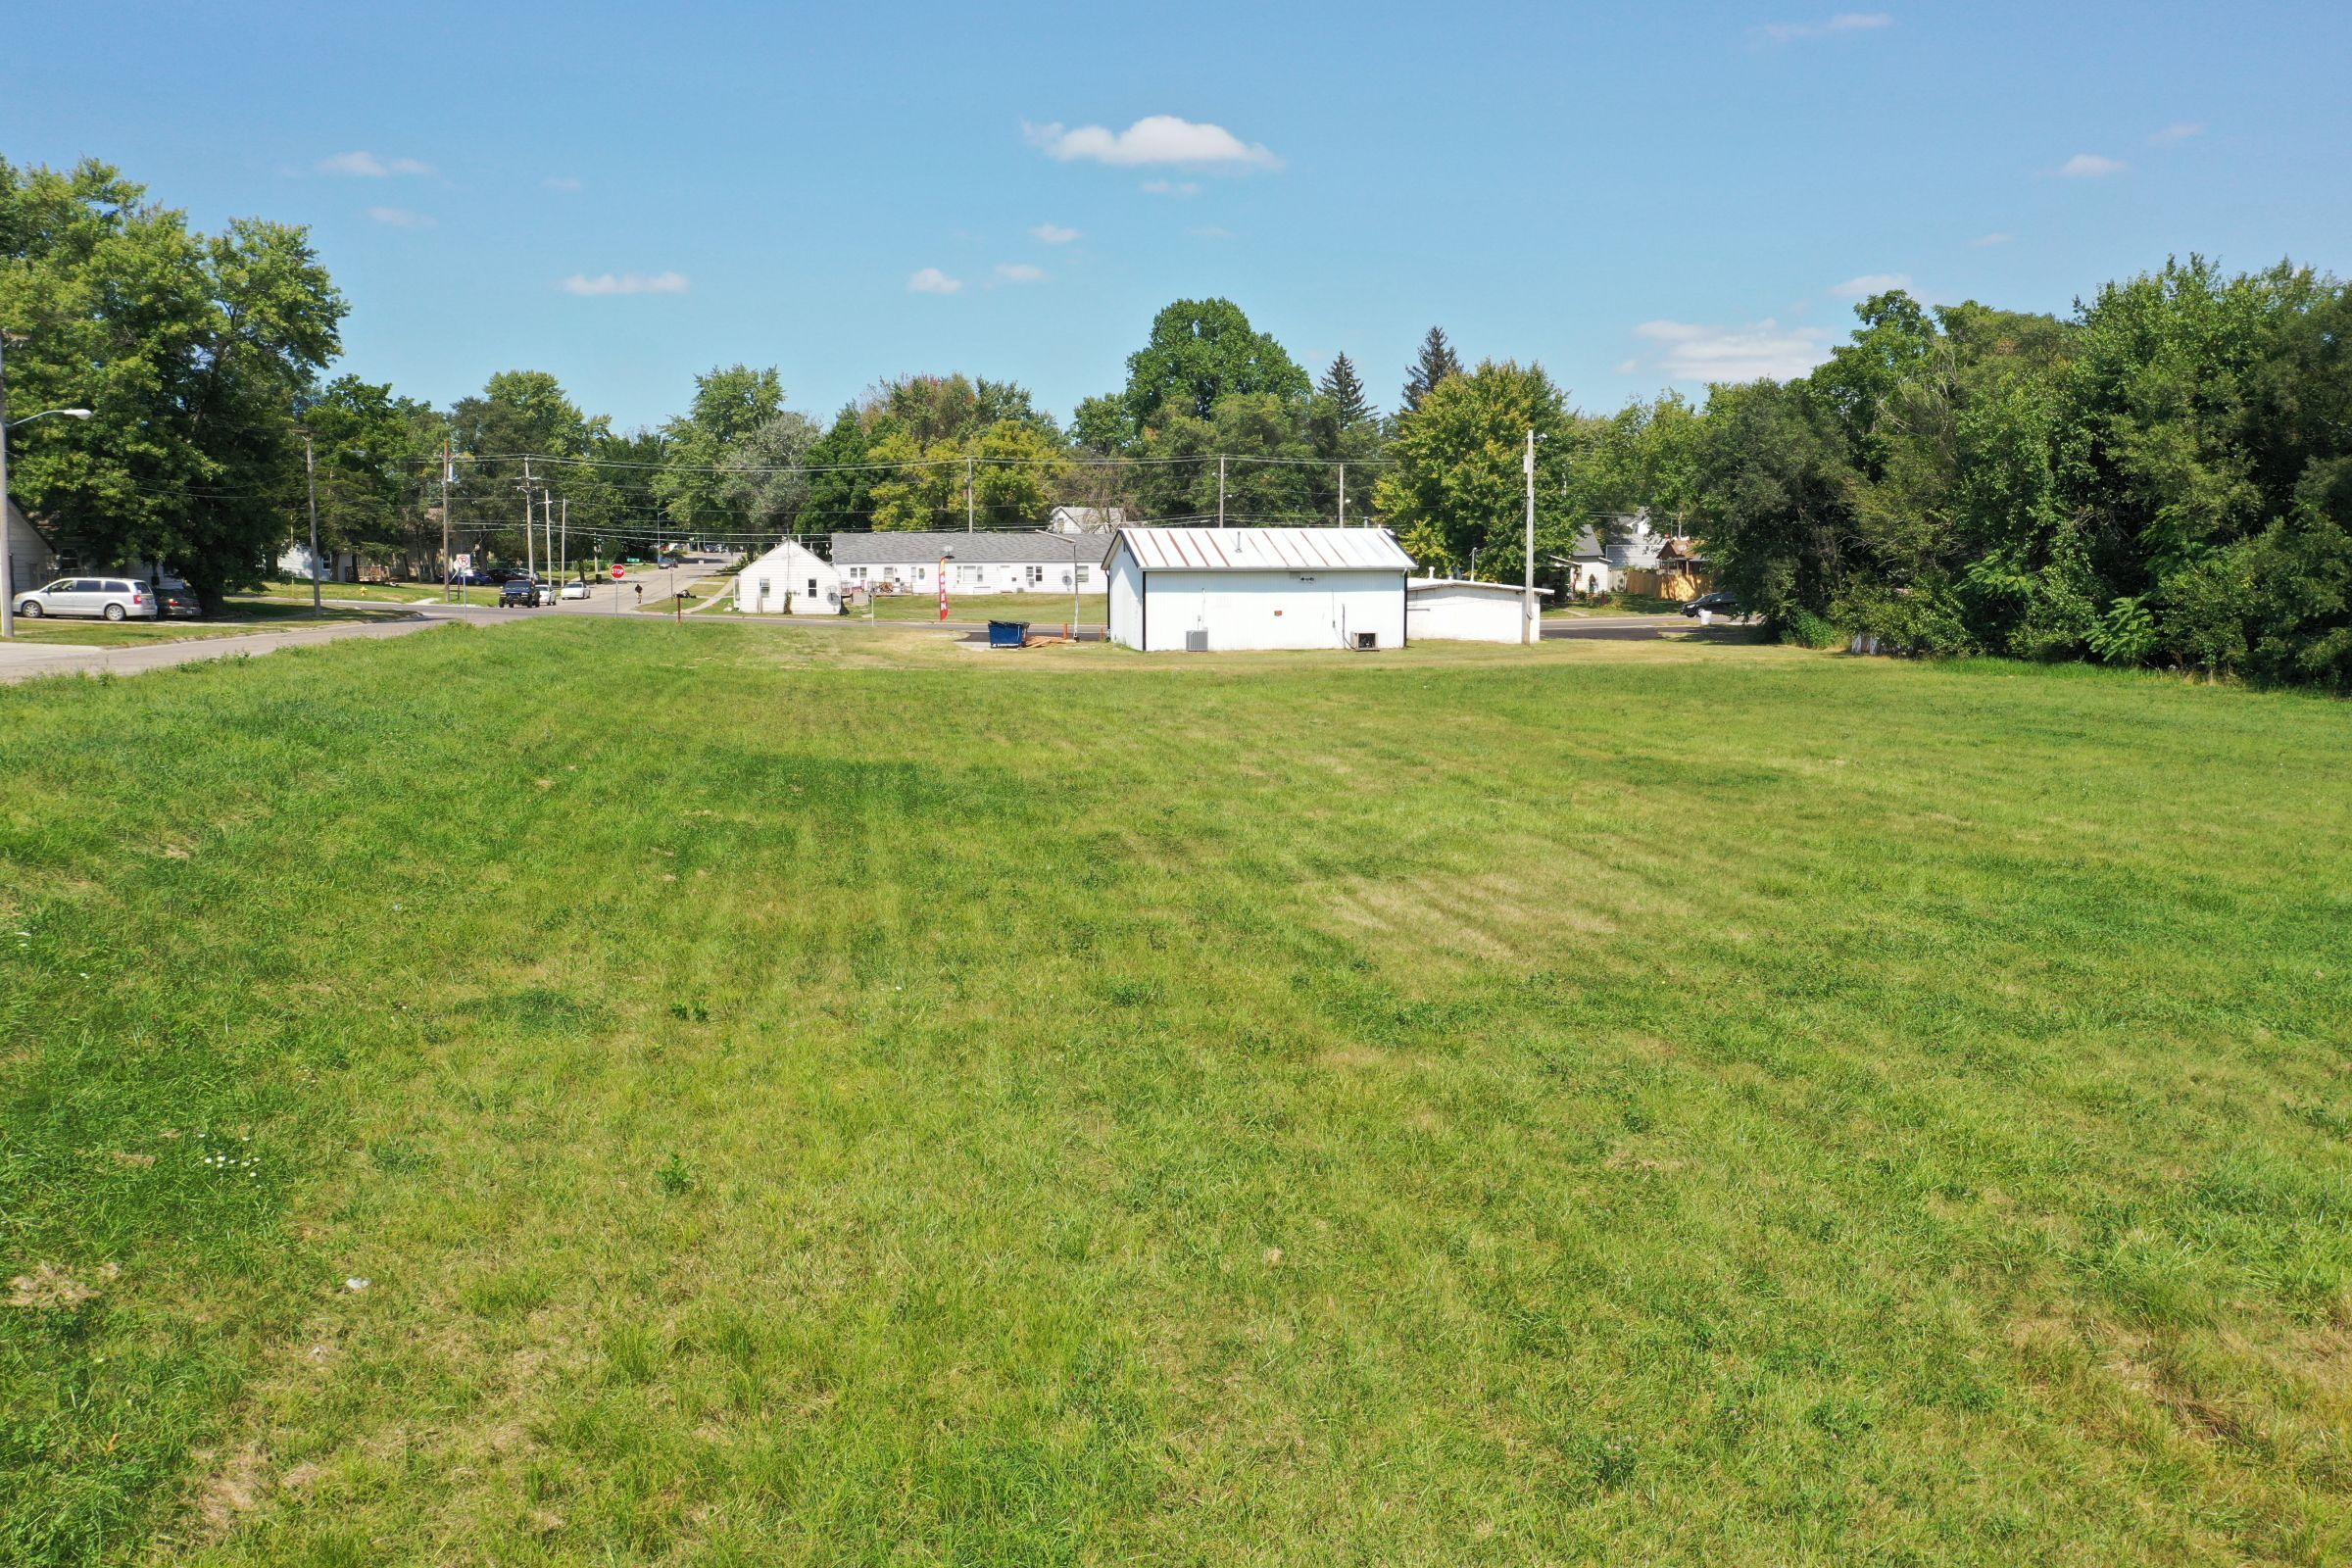 land-warren-county-iowa-2-acres-listing-number-15121-2-2020-09-01-190432.jpg